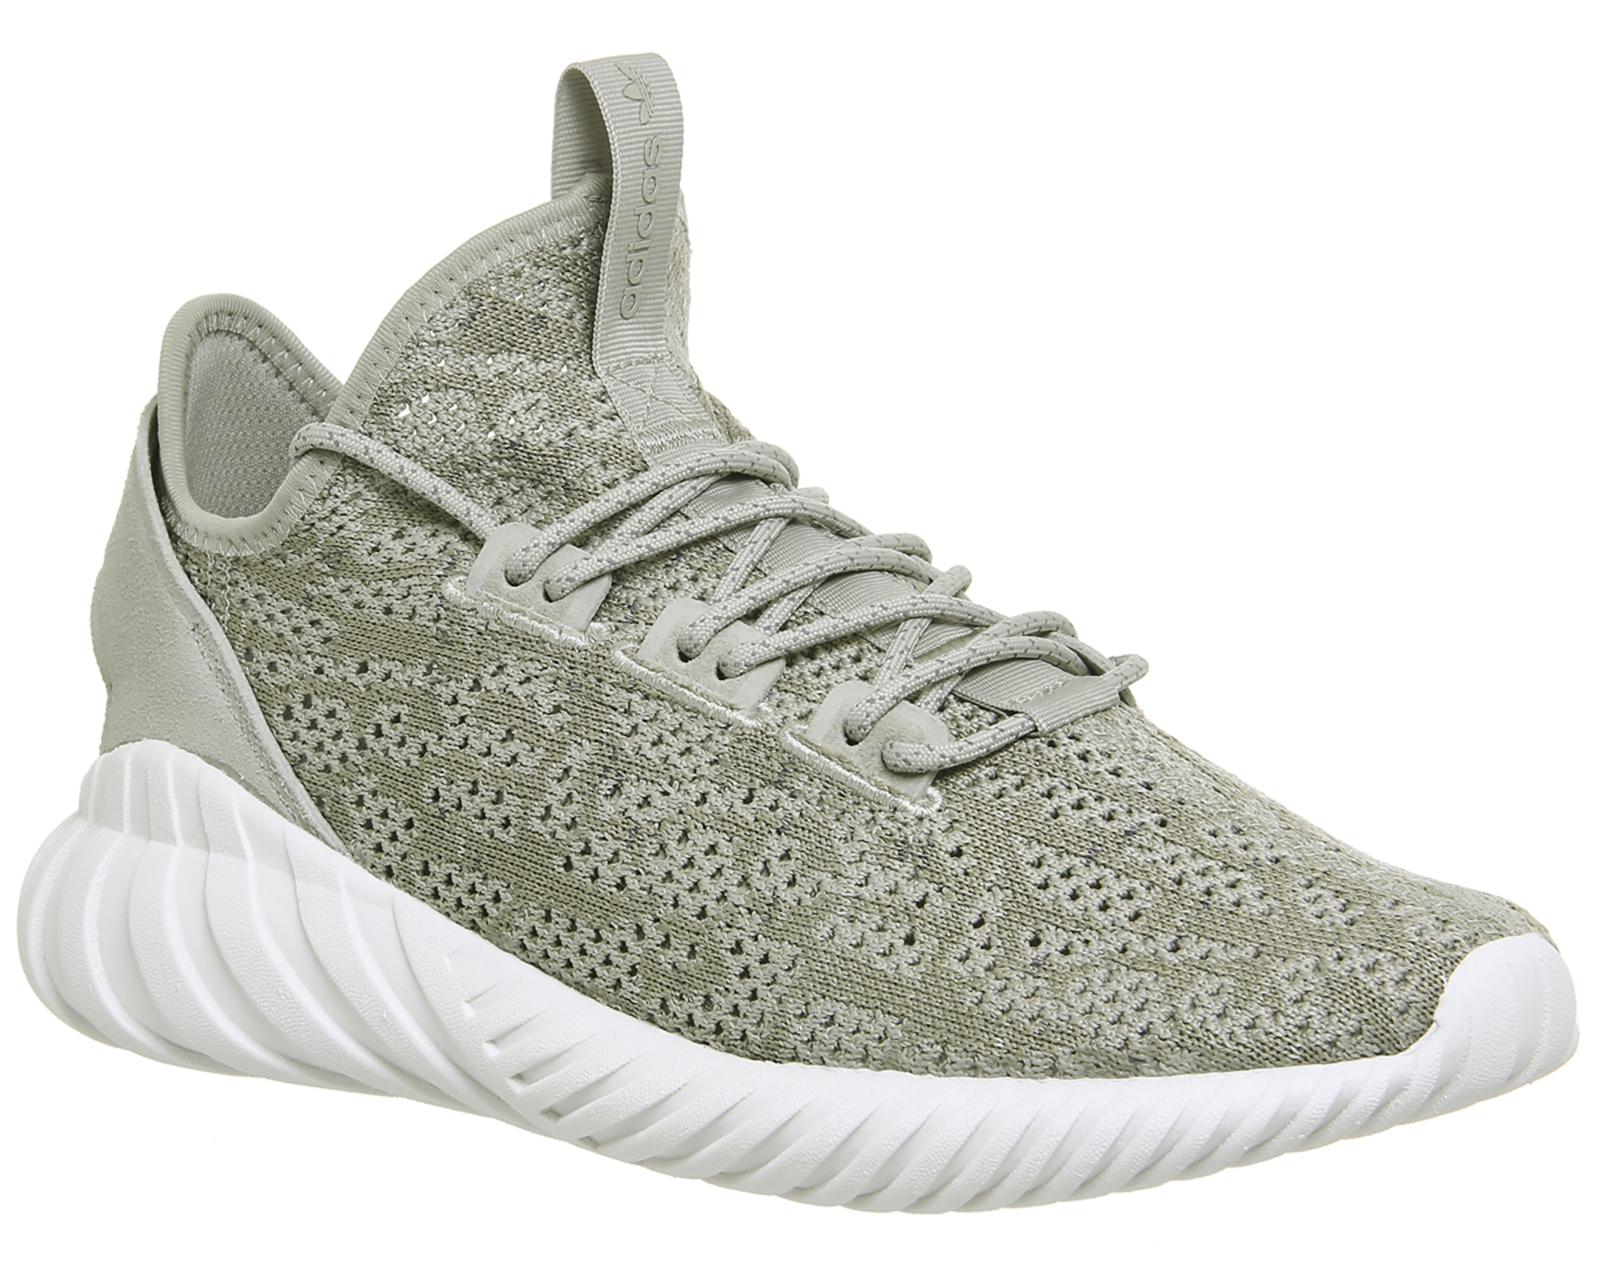 Hombre Adidas tubular Doom Sock Sesame zapatillas blancas zapatos eBay